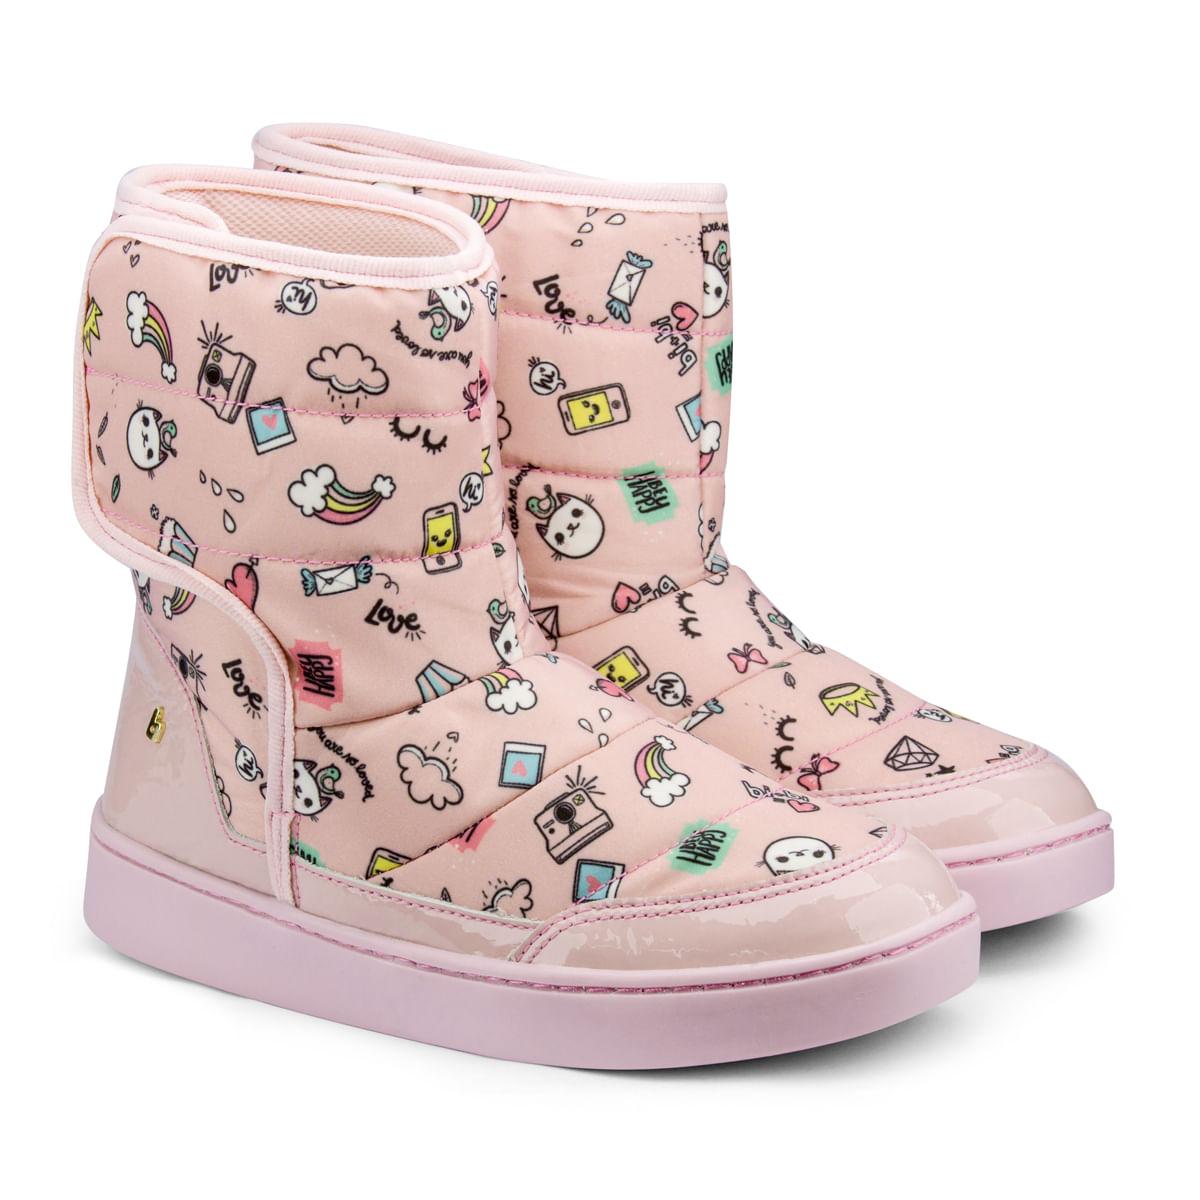 4aaec221e392a6 Bota Infantil Bibi Feminina Rosa Estampada Urban Boots 1087015 ...